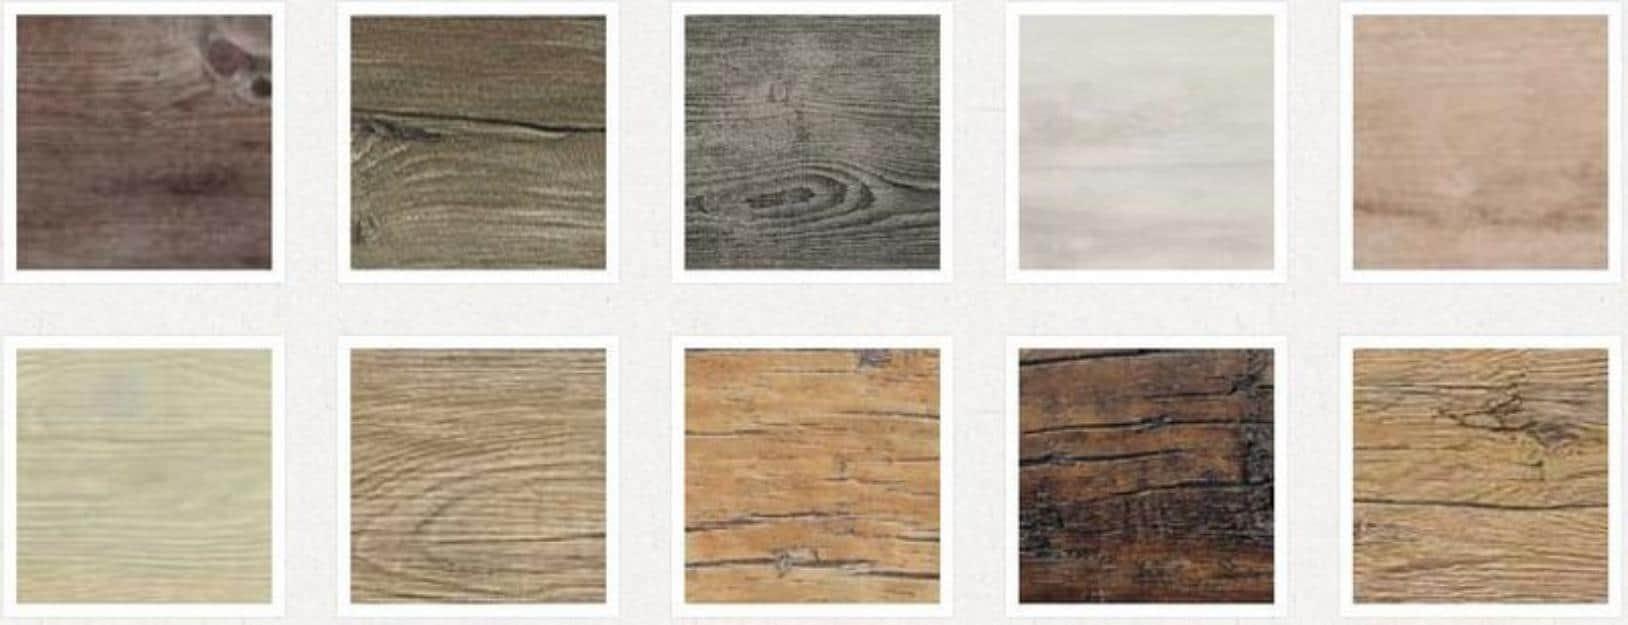 Floor tiles interior design vinyl floor tiles interior design dailygadgetfo Images